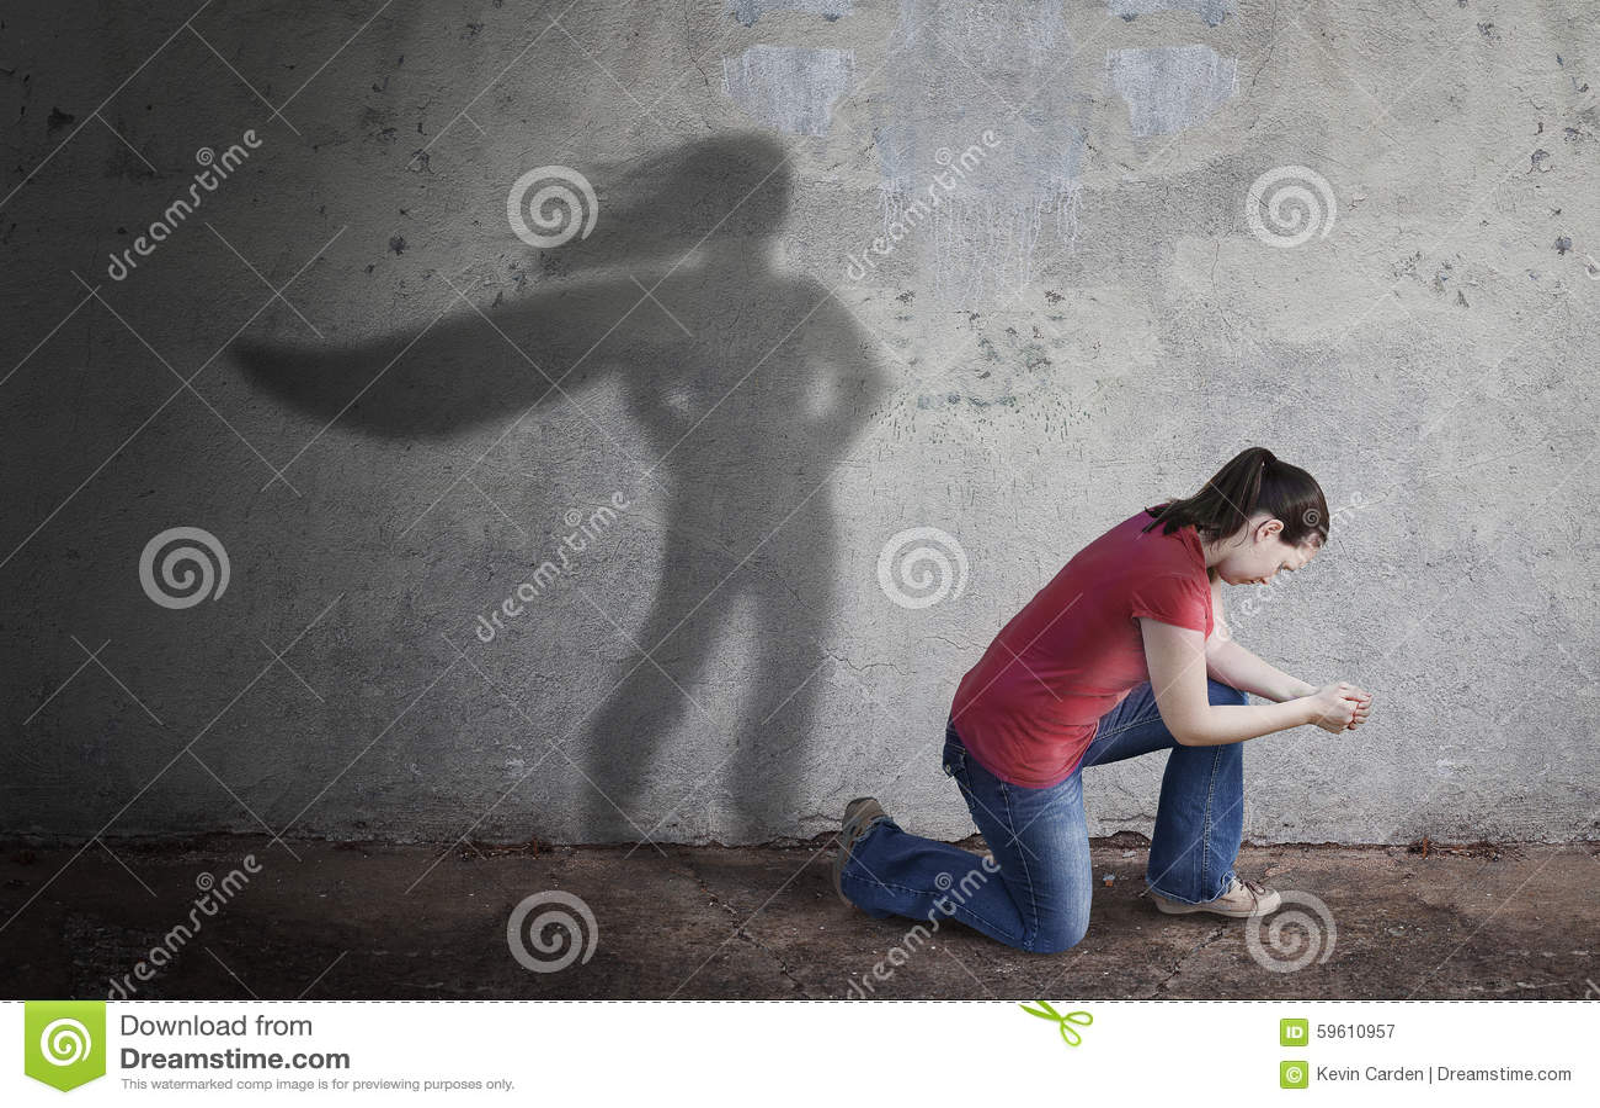 Superhero Shadow